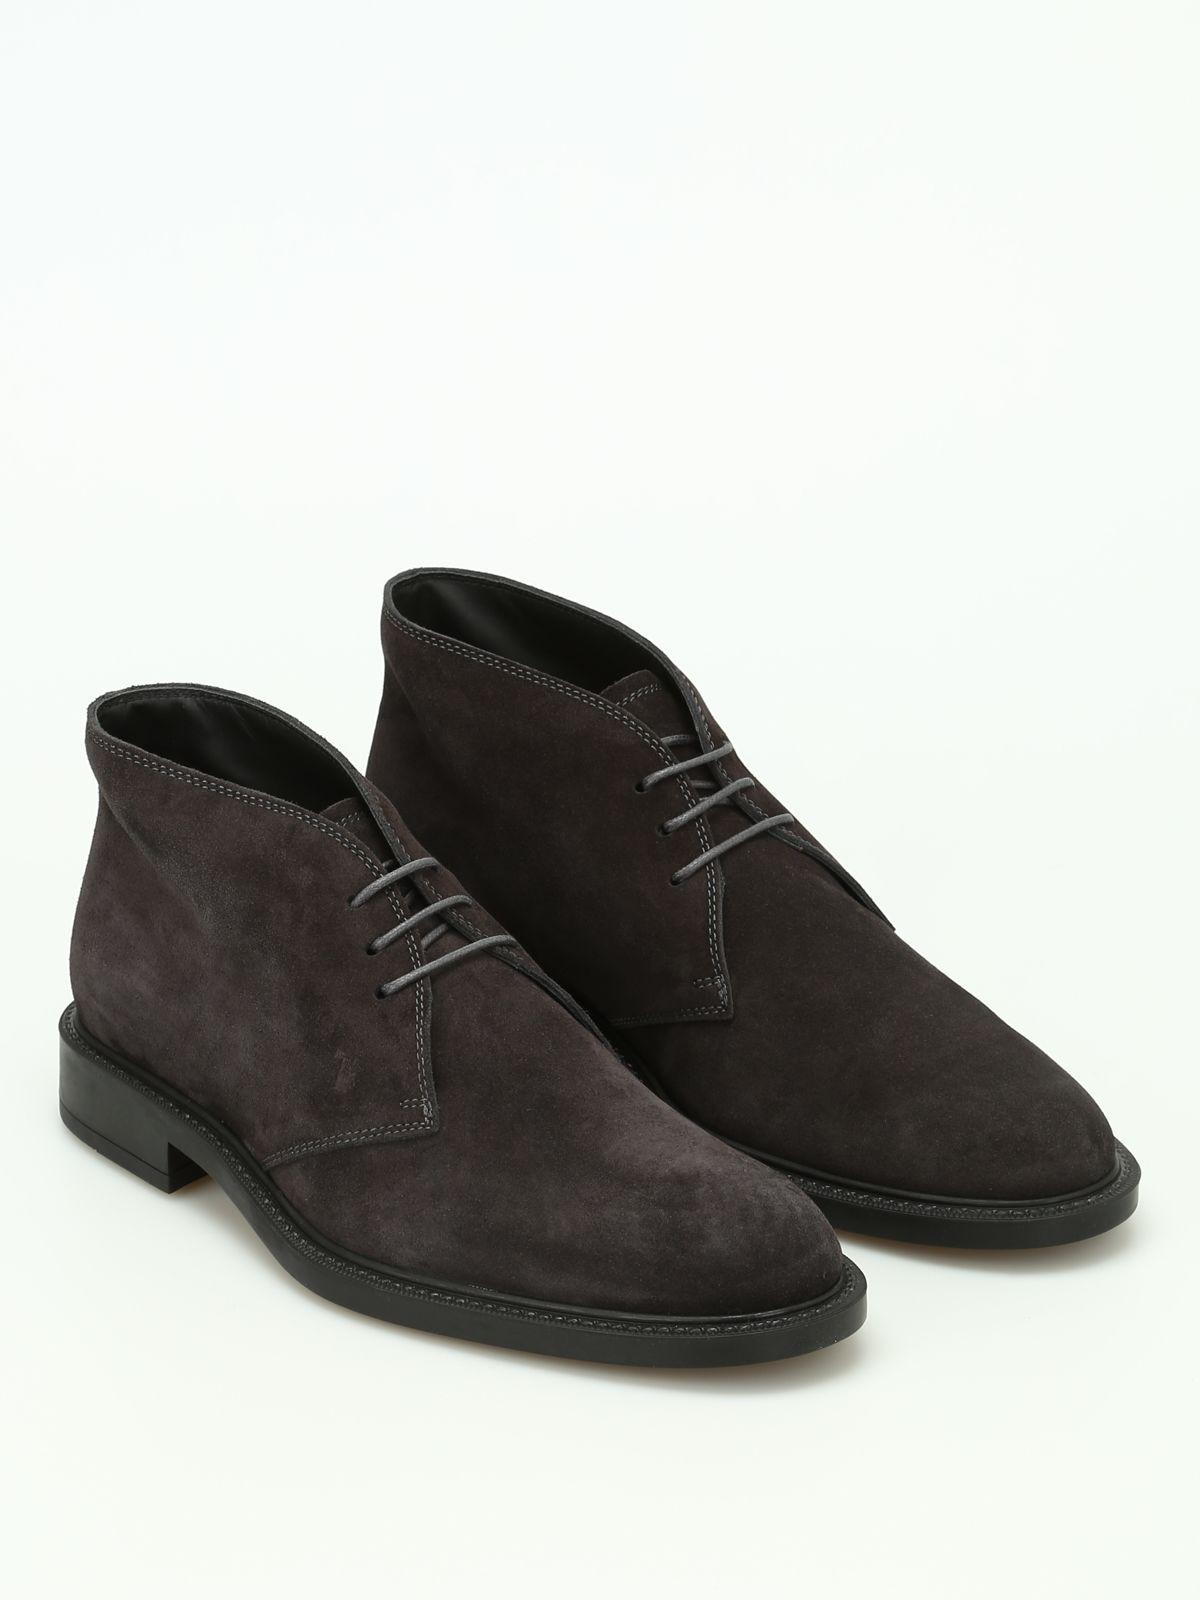 45a Suede Desert Boots